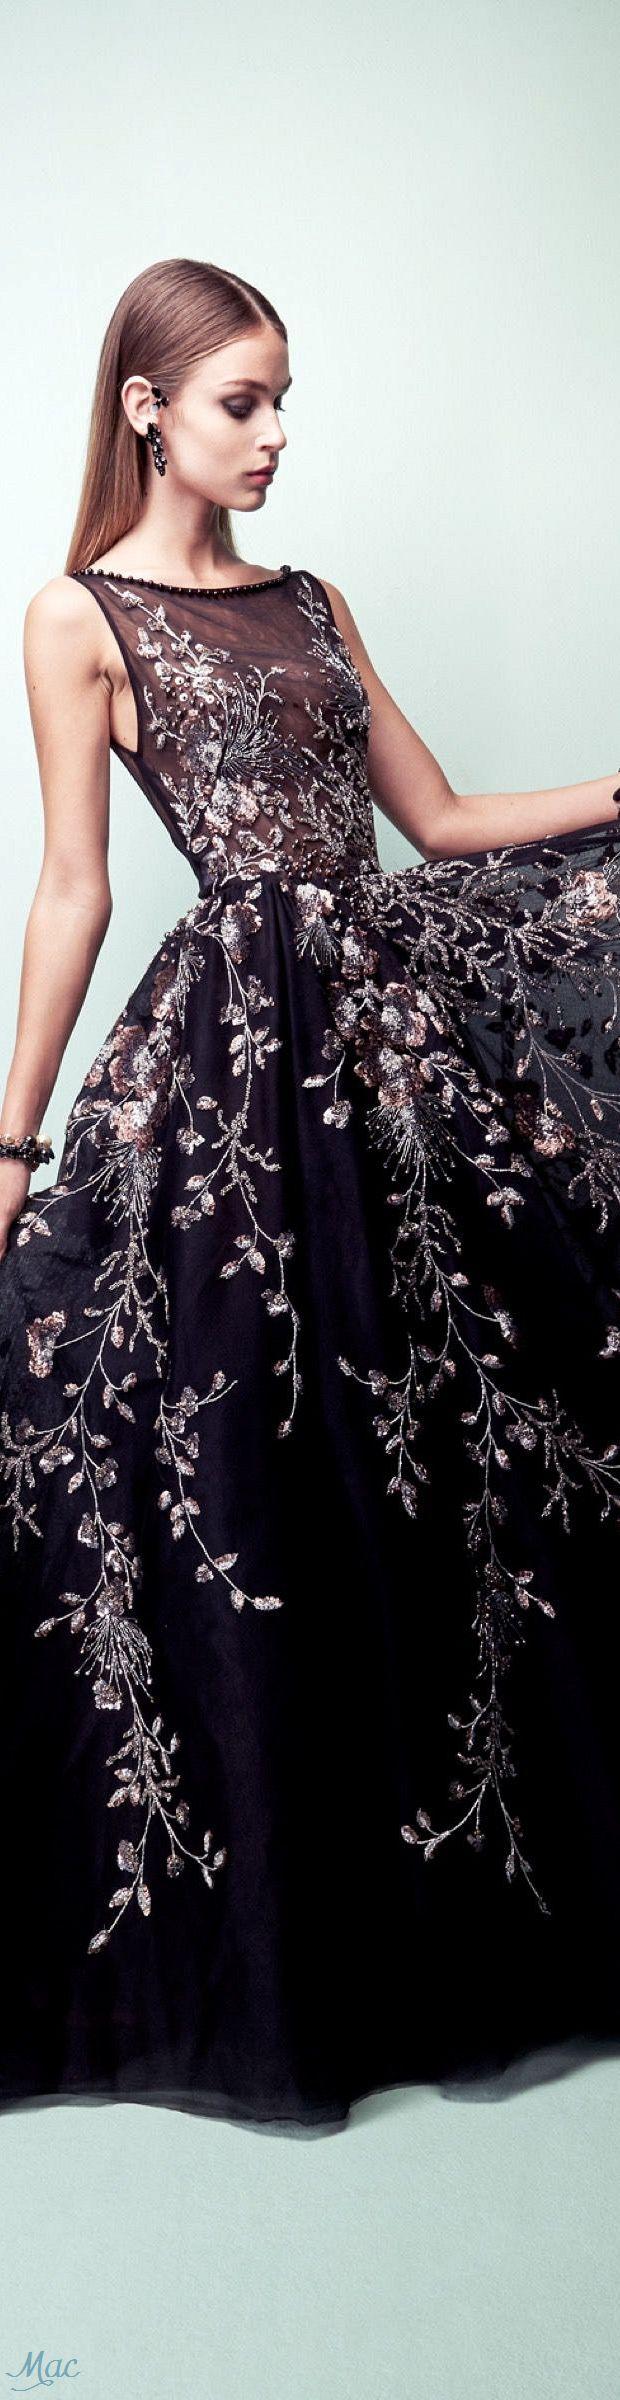 Spring 2017 Ready-to-Wear Georges Hobeika #mallchick #fashion